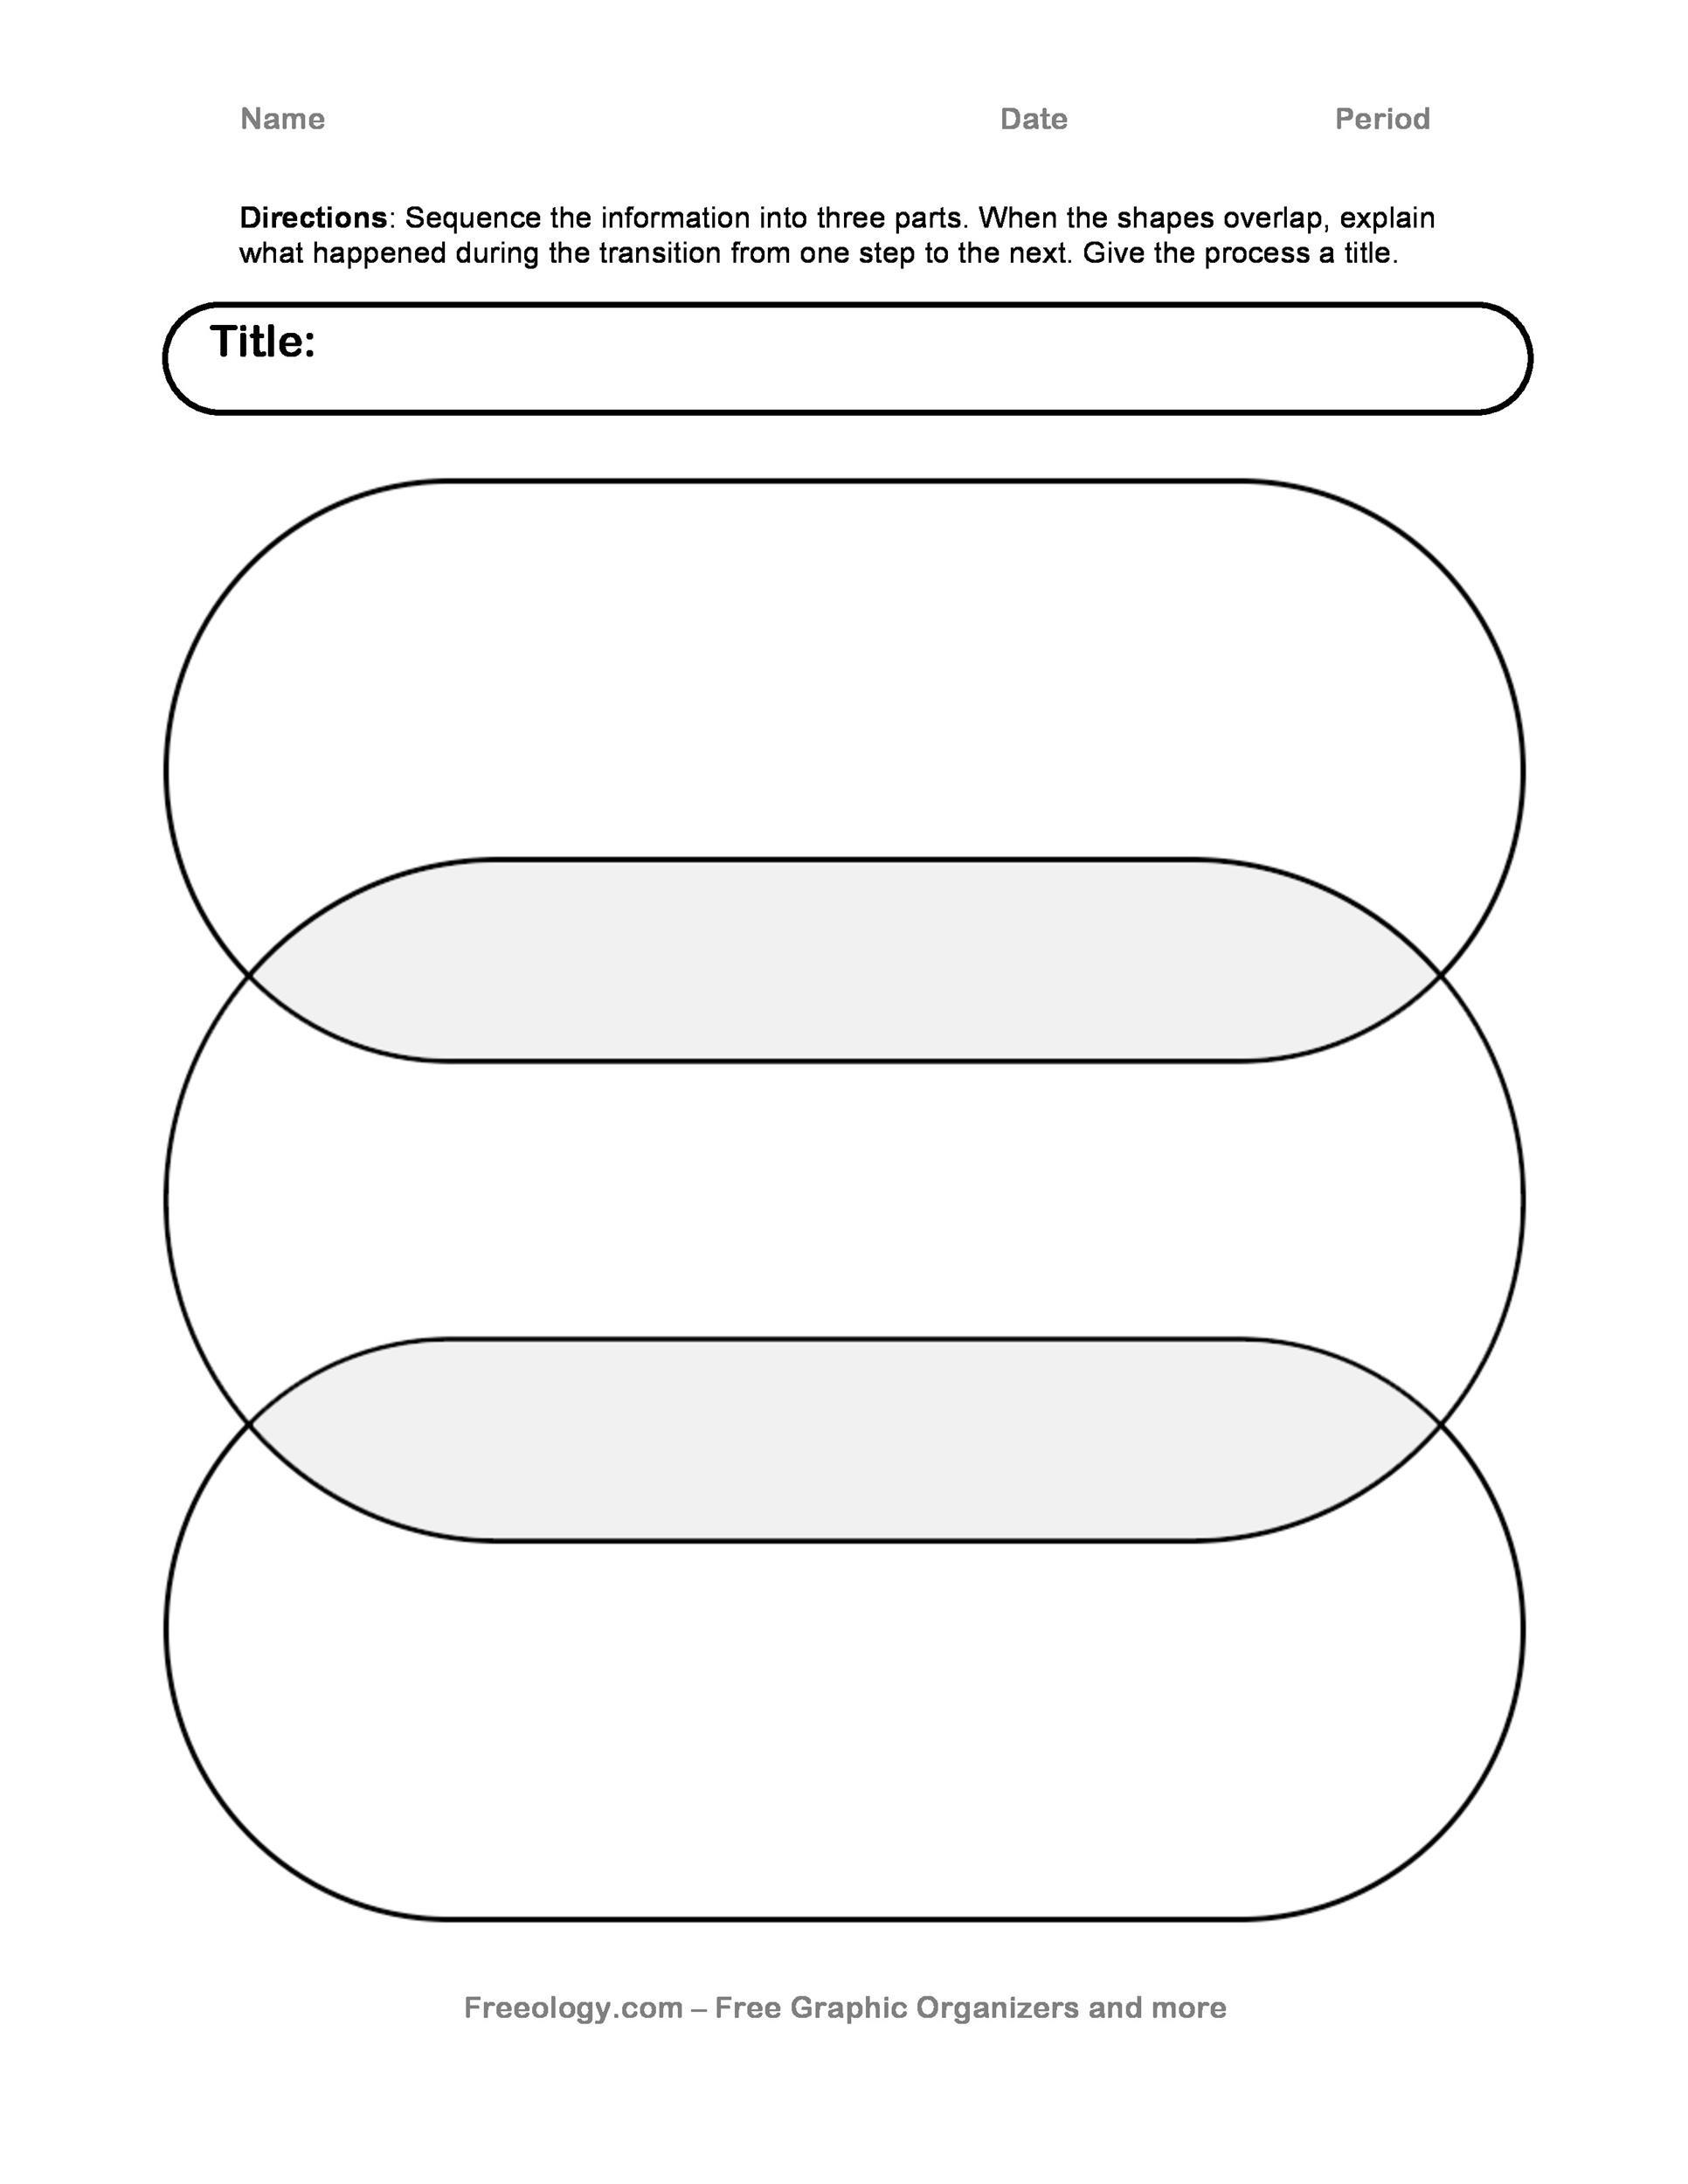 Psychsim 5 Worksheets Word  Free Venn Diagram Templates Word Pdf  Template Lab Islamic Worksheets For Kids Pdf with Addition Worksheet For Grade 1 Word Venn Diagram Template  Addition To Ten Worksheets Word